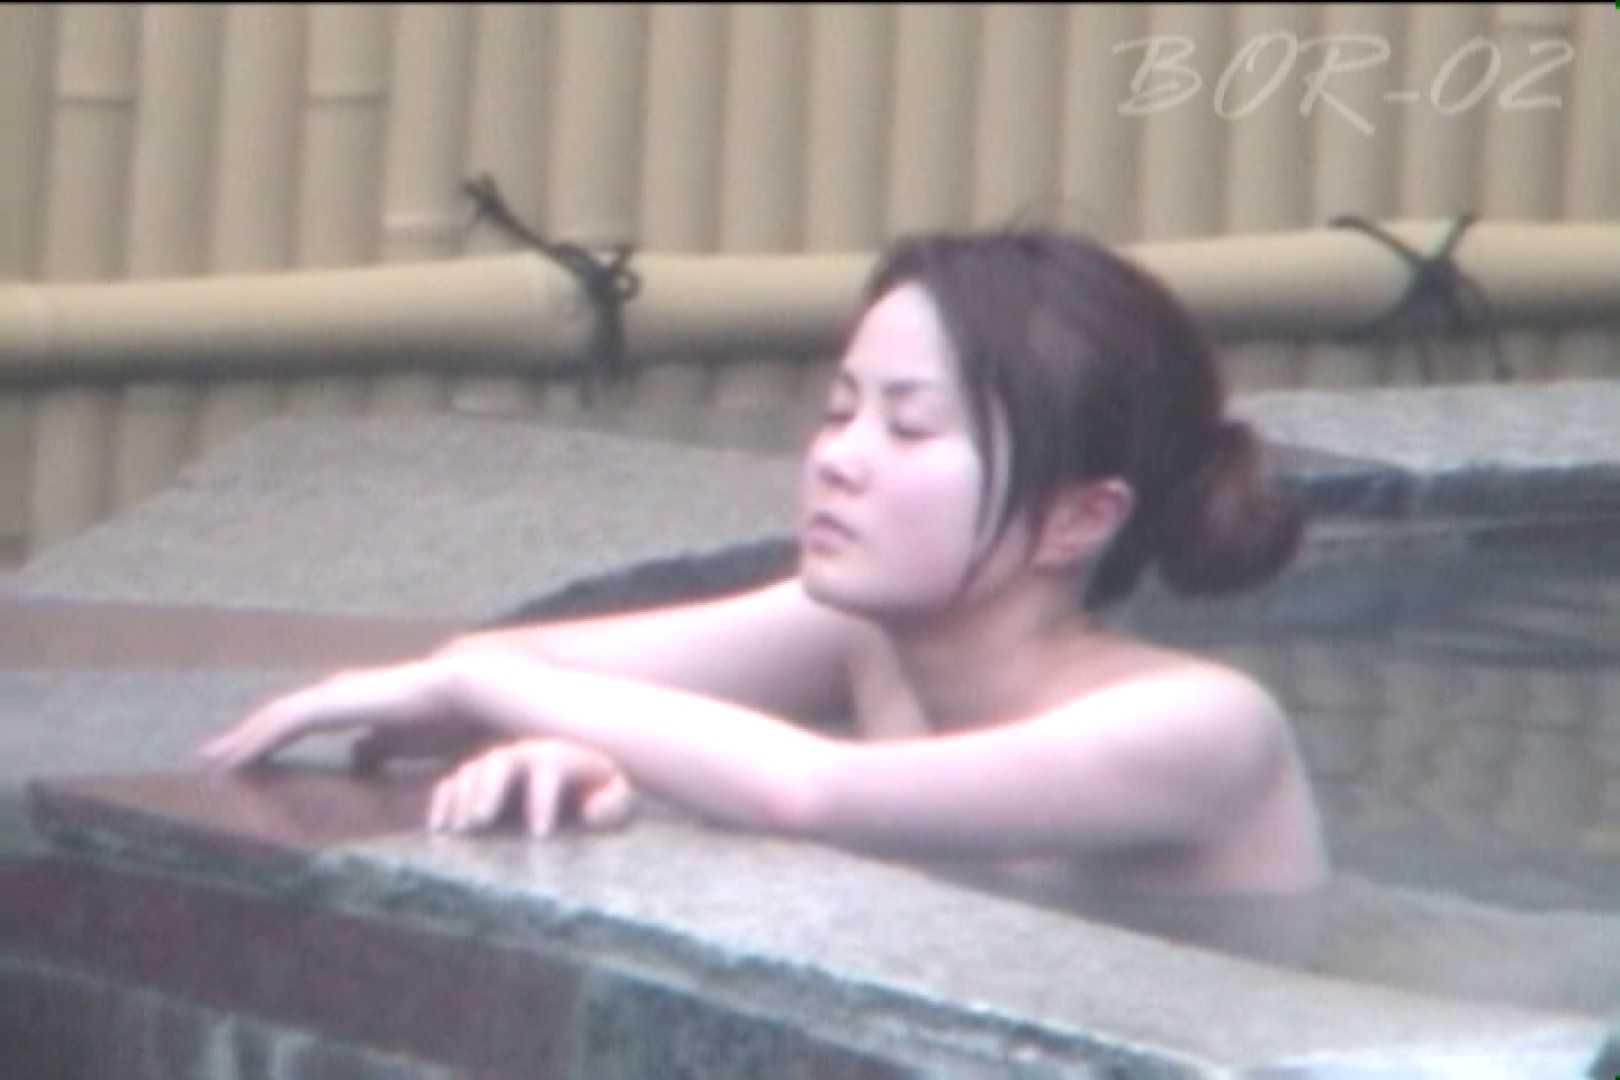 Aquaな露天風呂Vol.474 0 | HなOL  113pic 61